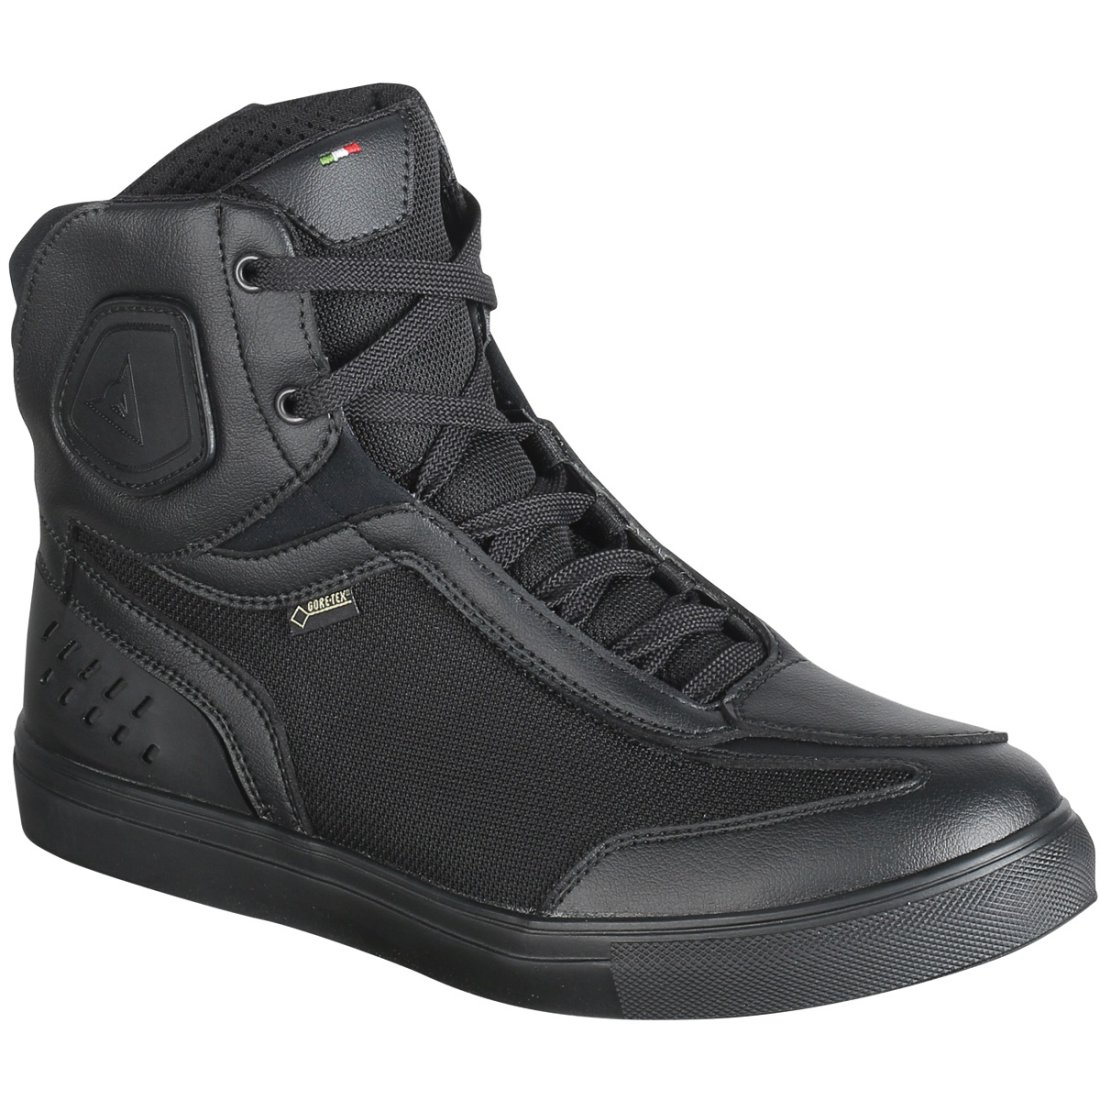 DAINESE Street Darker Gore-Tex Black Boots · Motocard ba324055ba